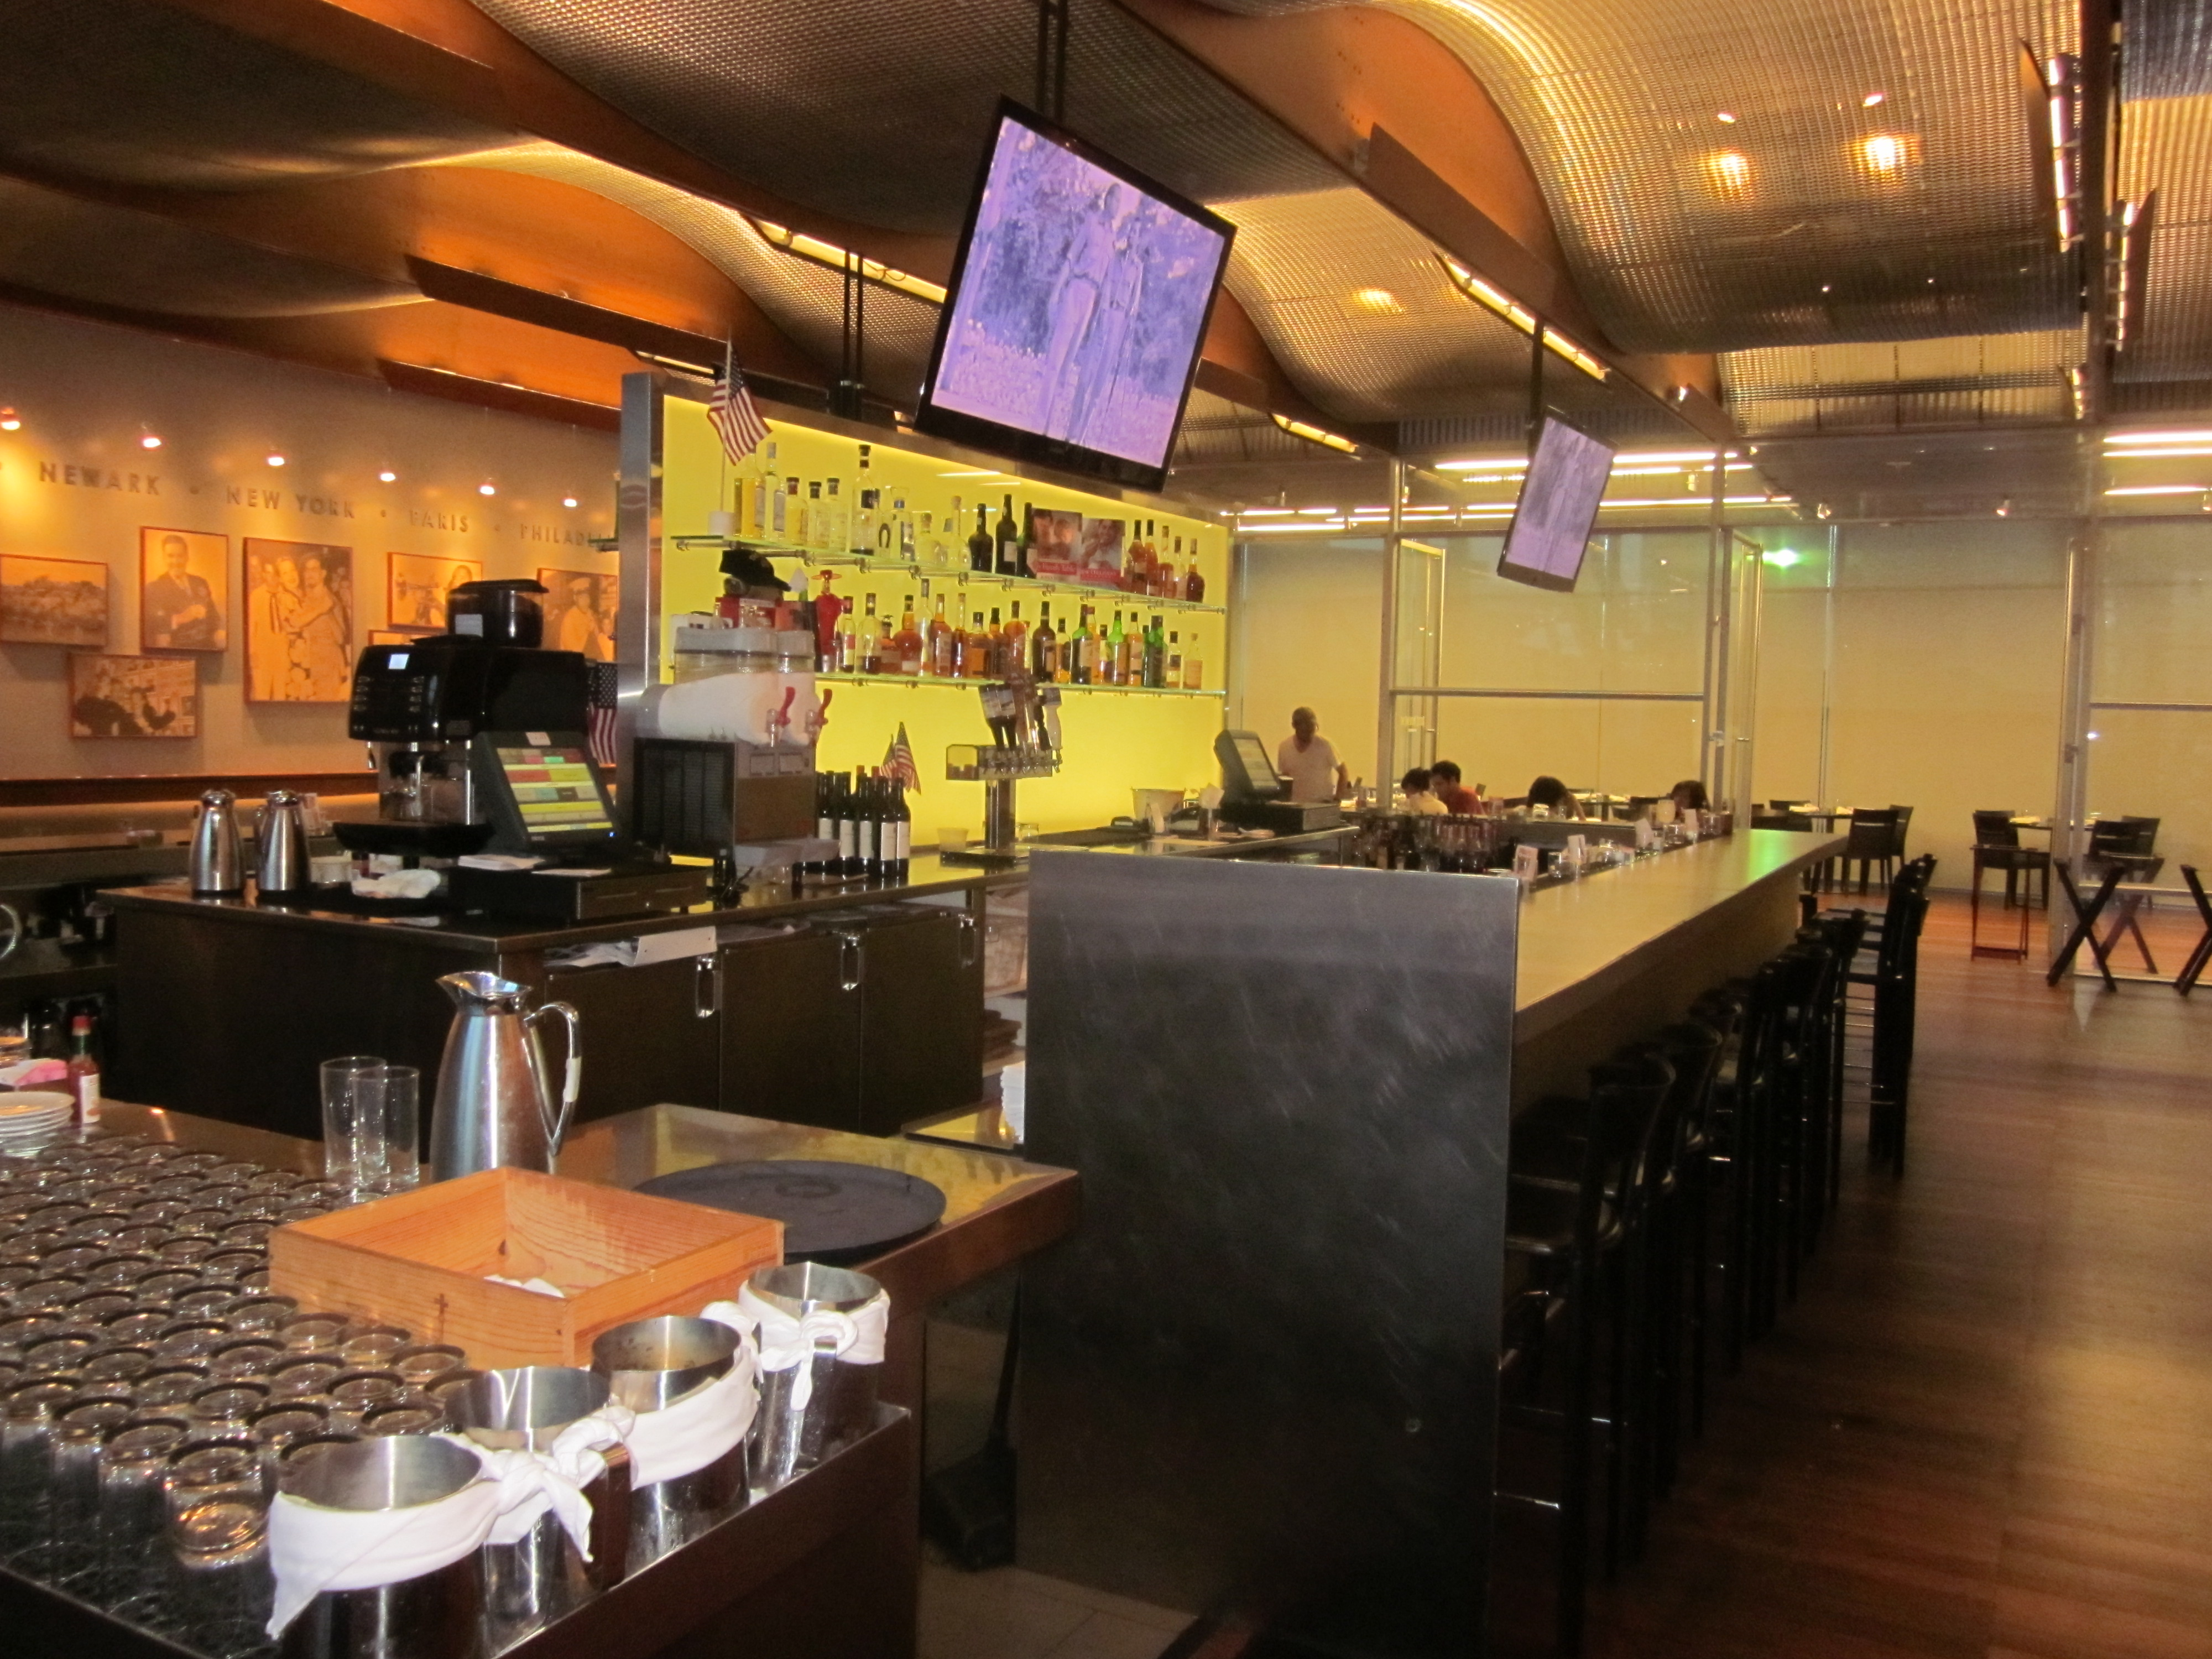 american restaurants - photo #28